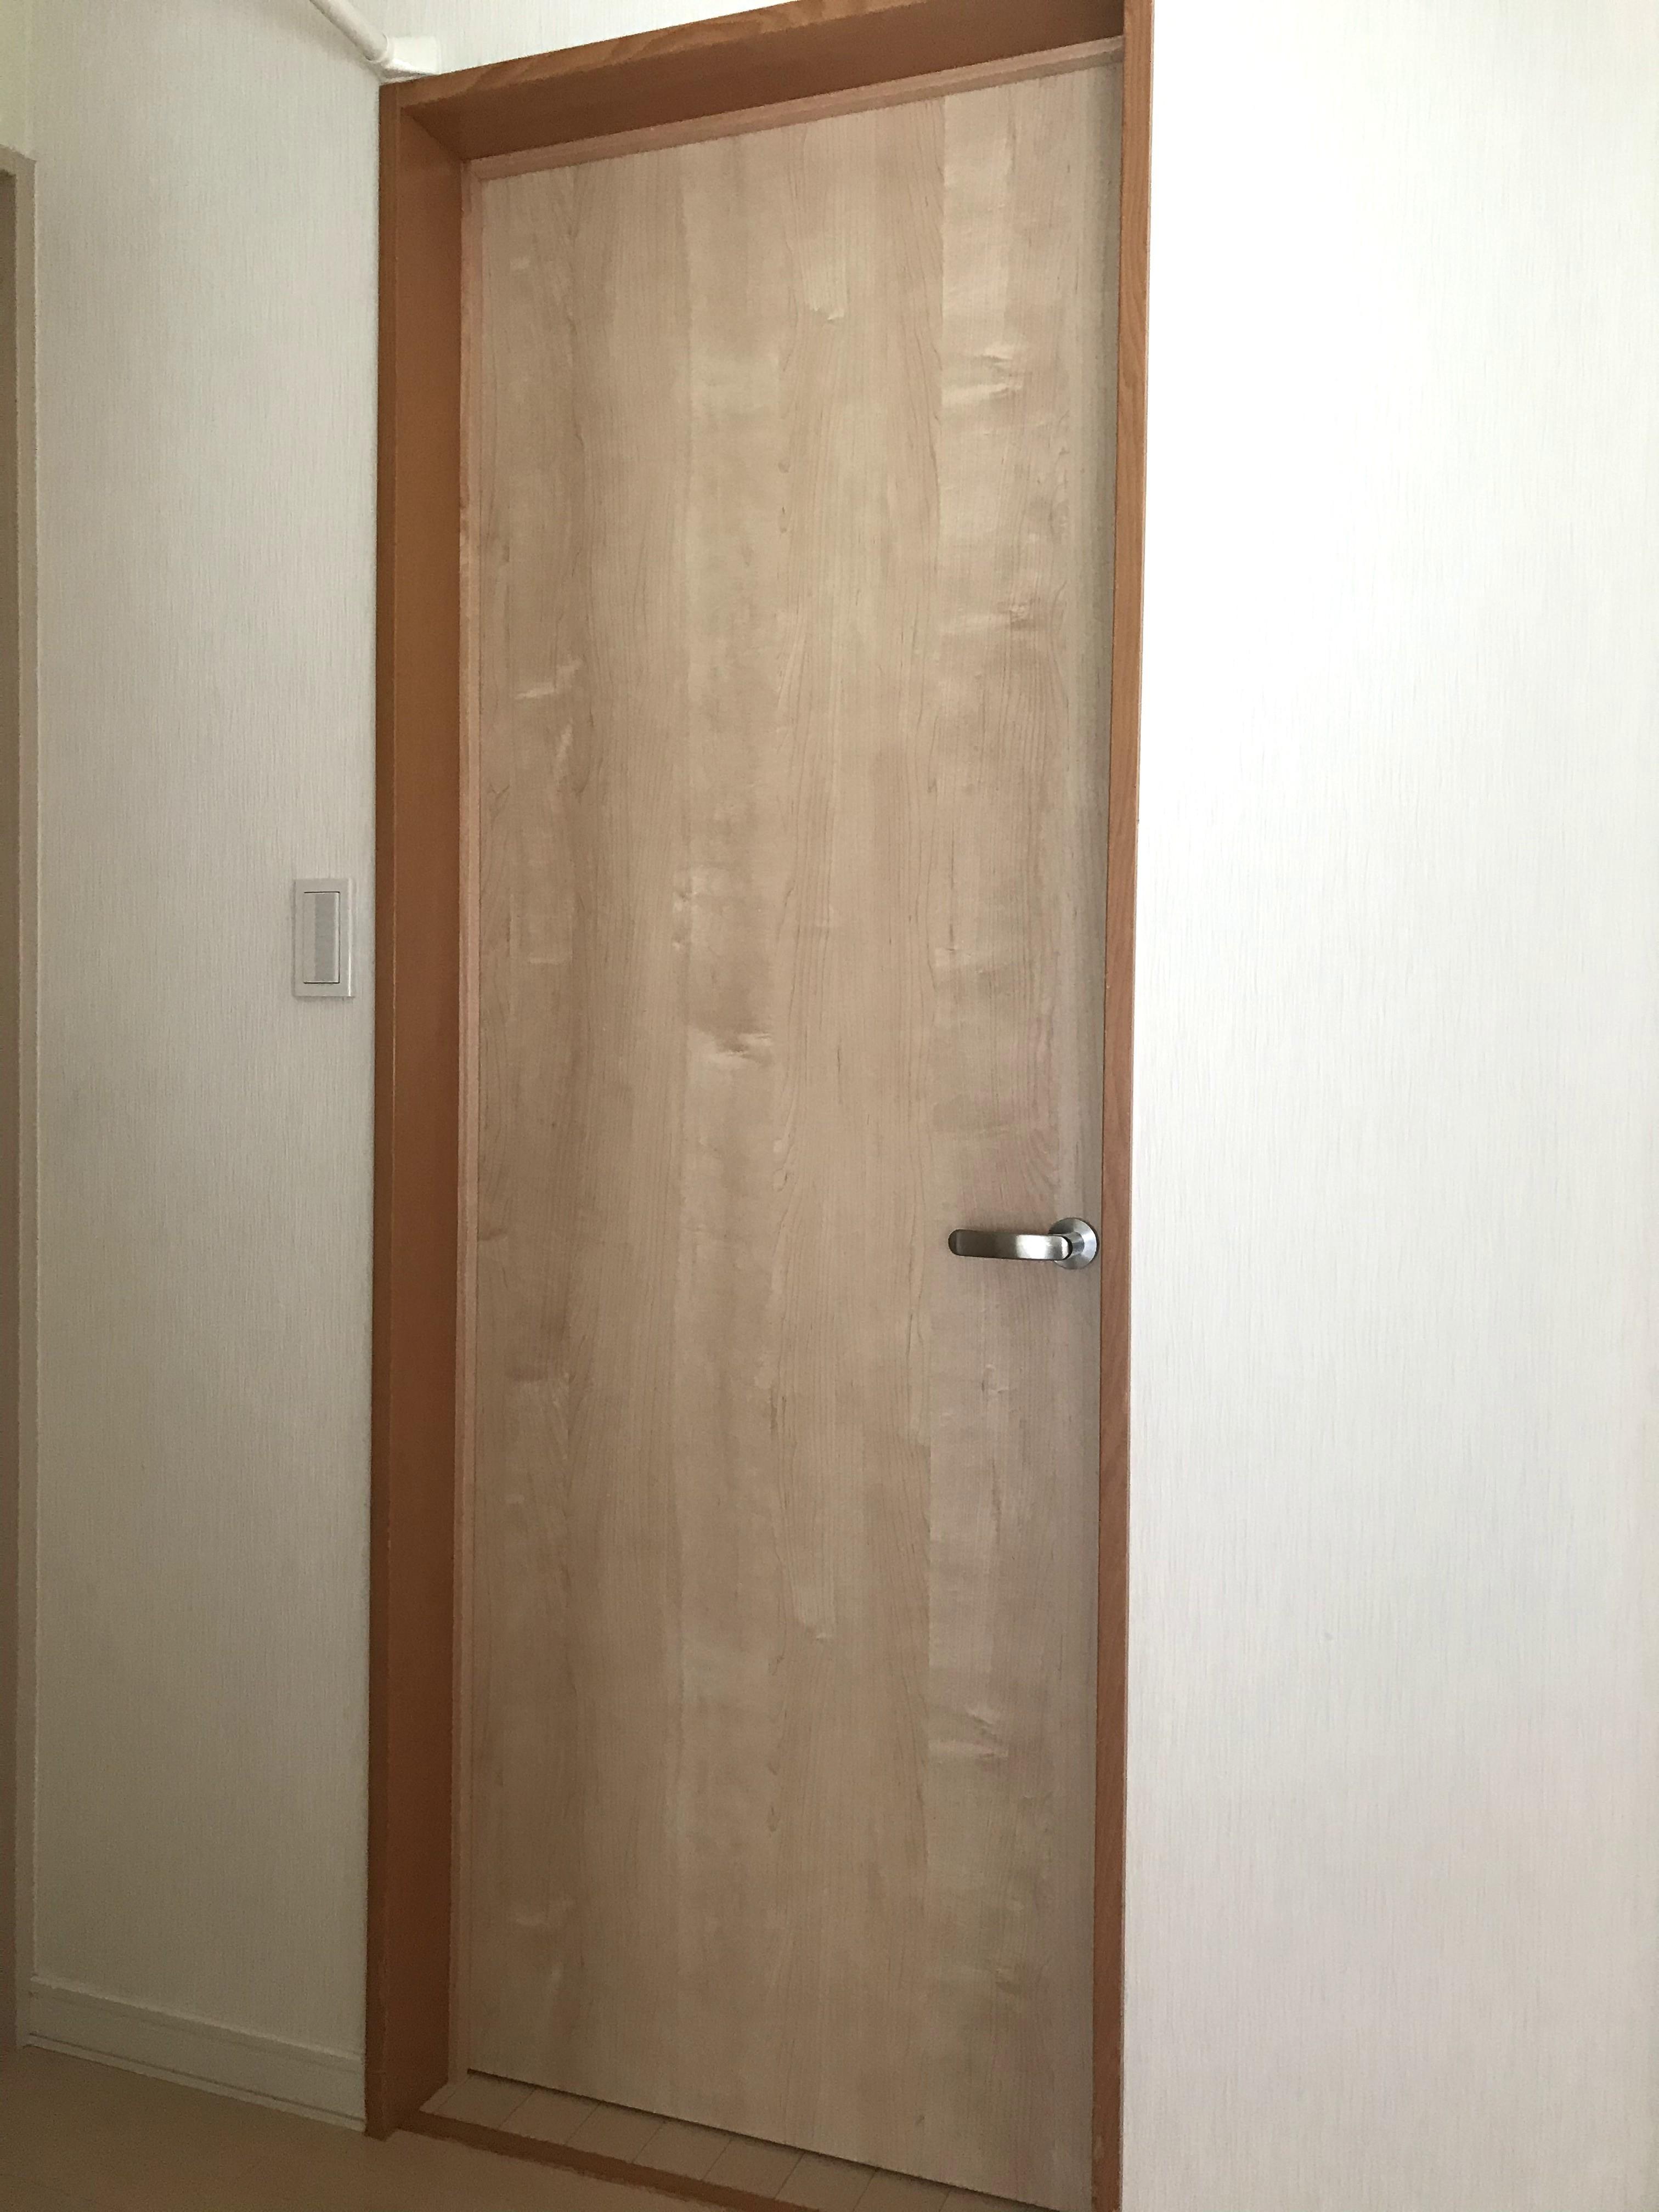 室内ドア新設